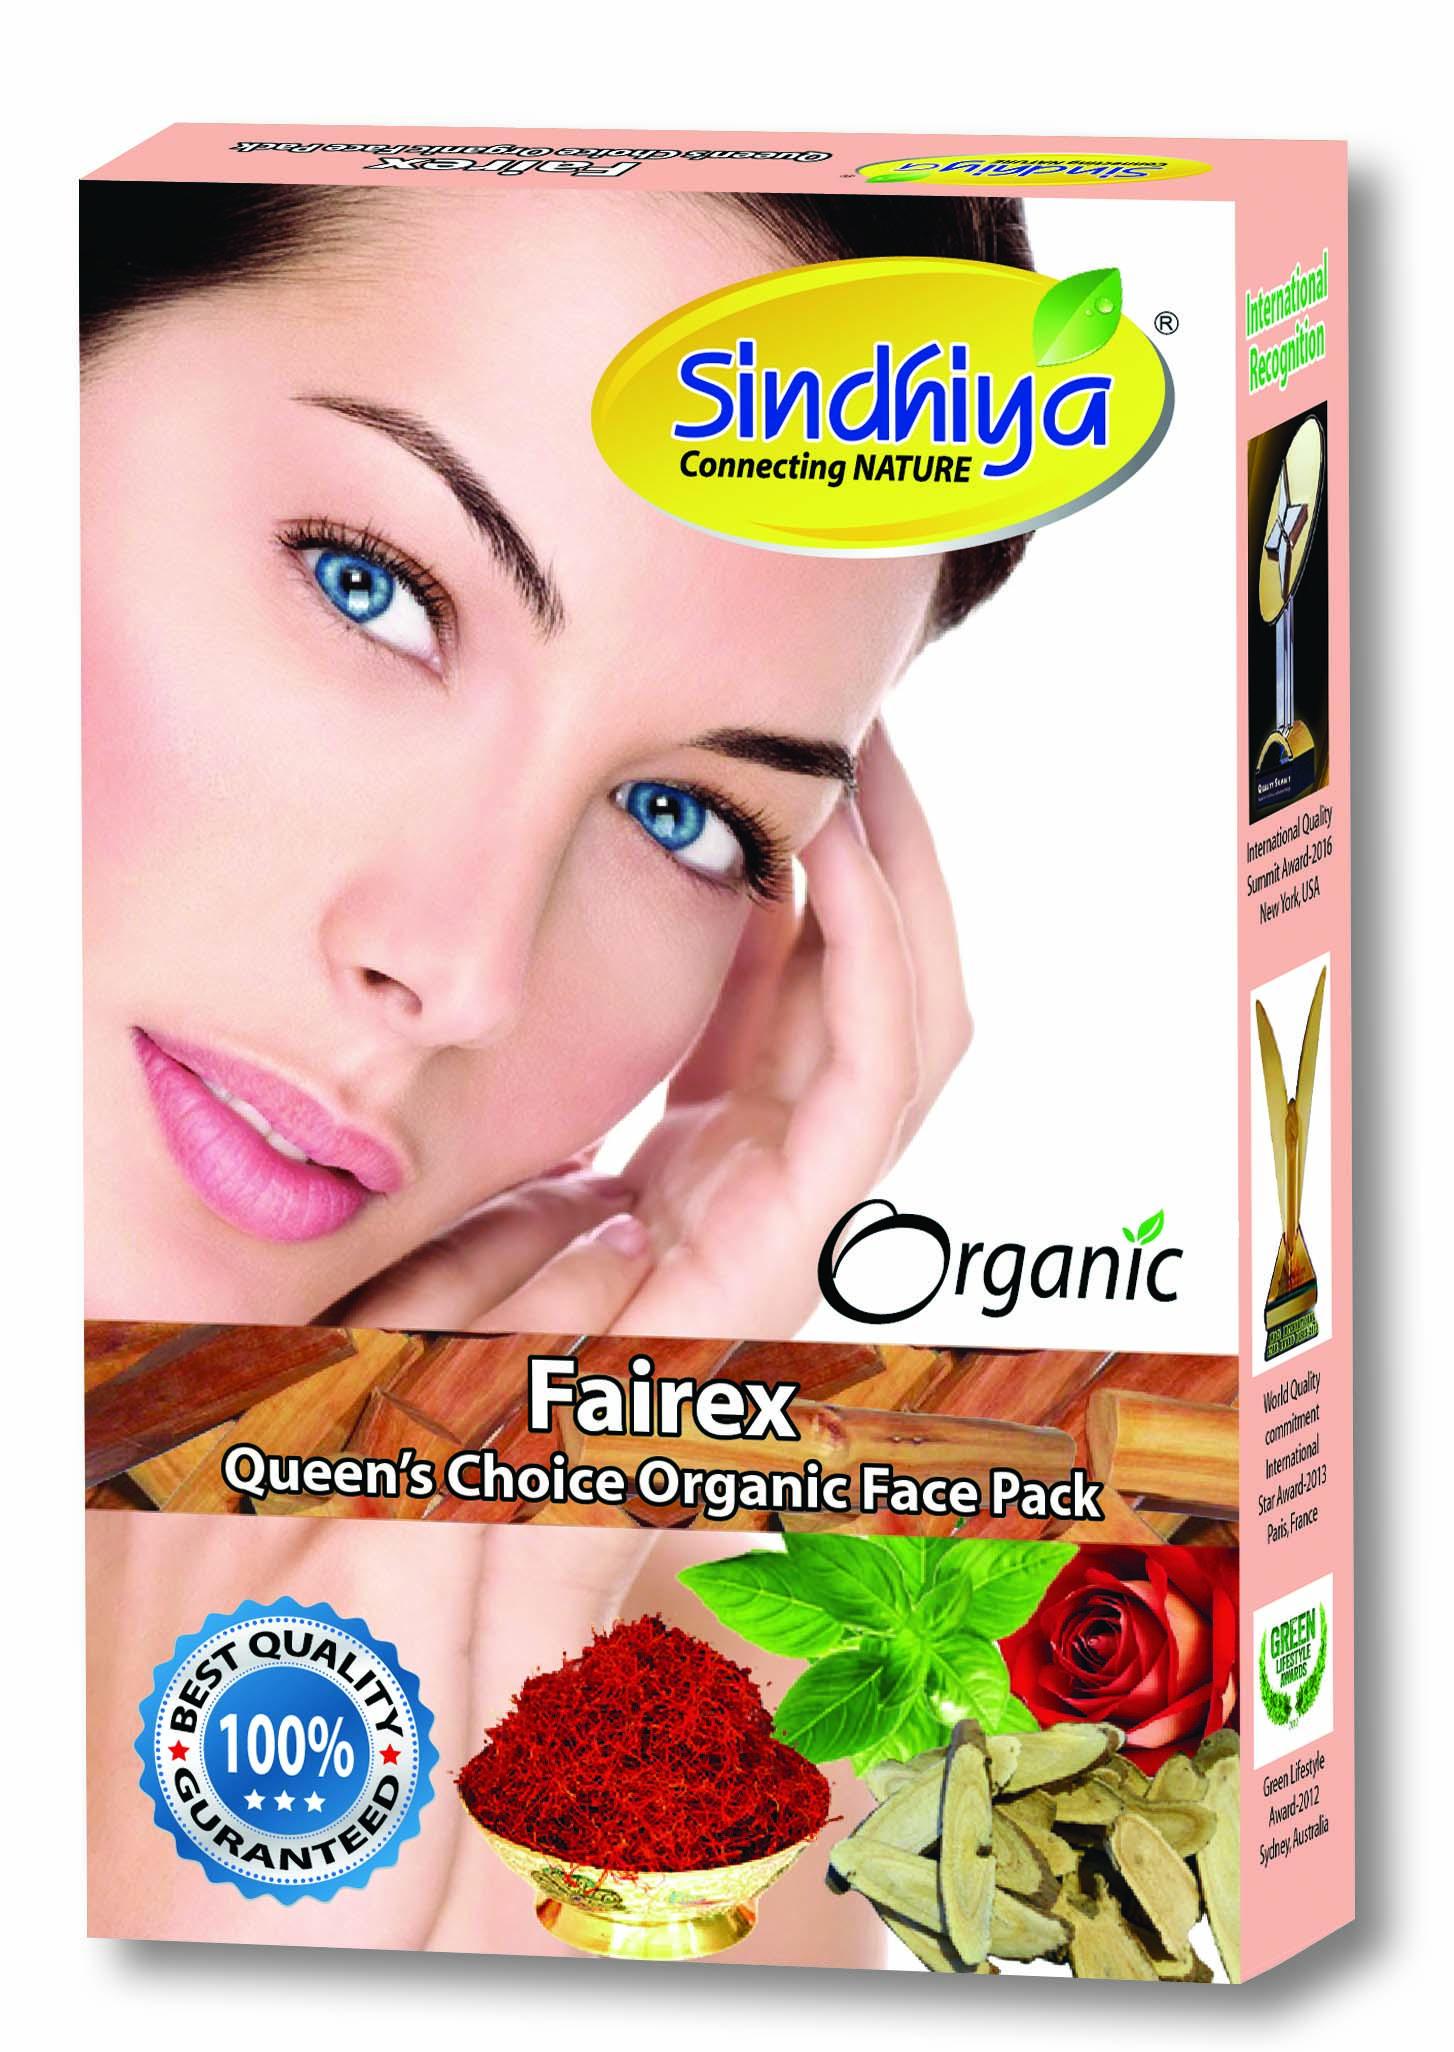 Fairex - Queen's Choice Organic Face Pack